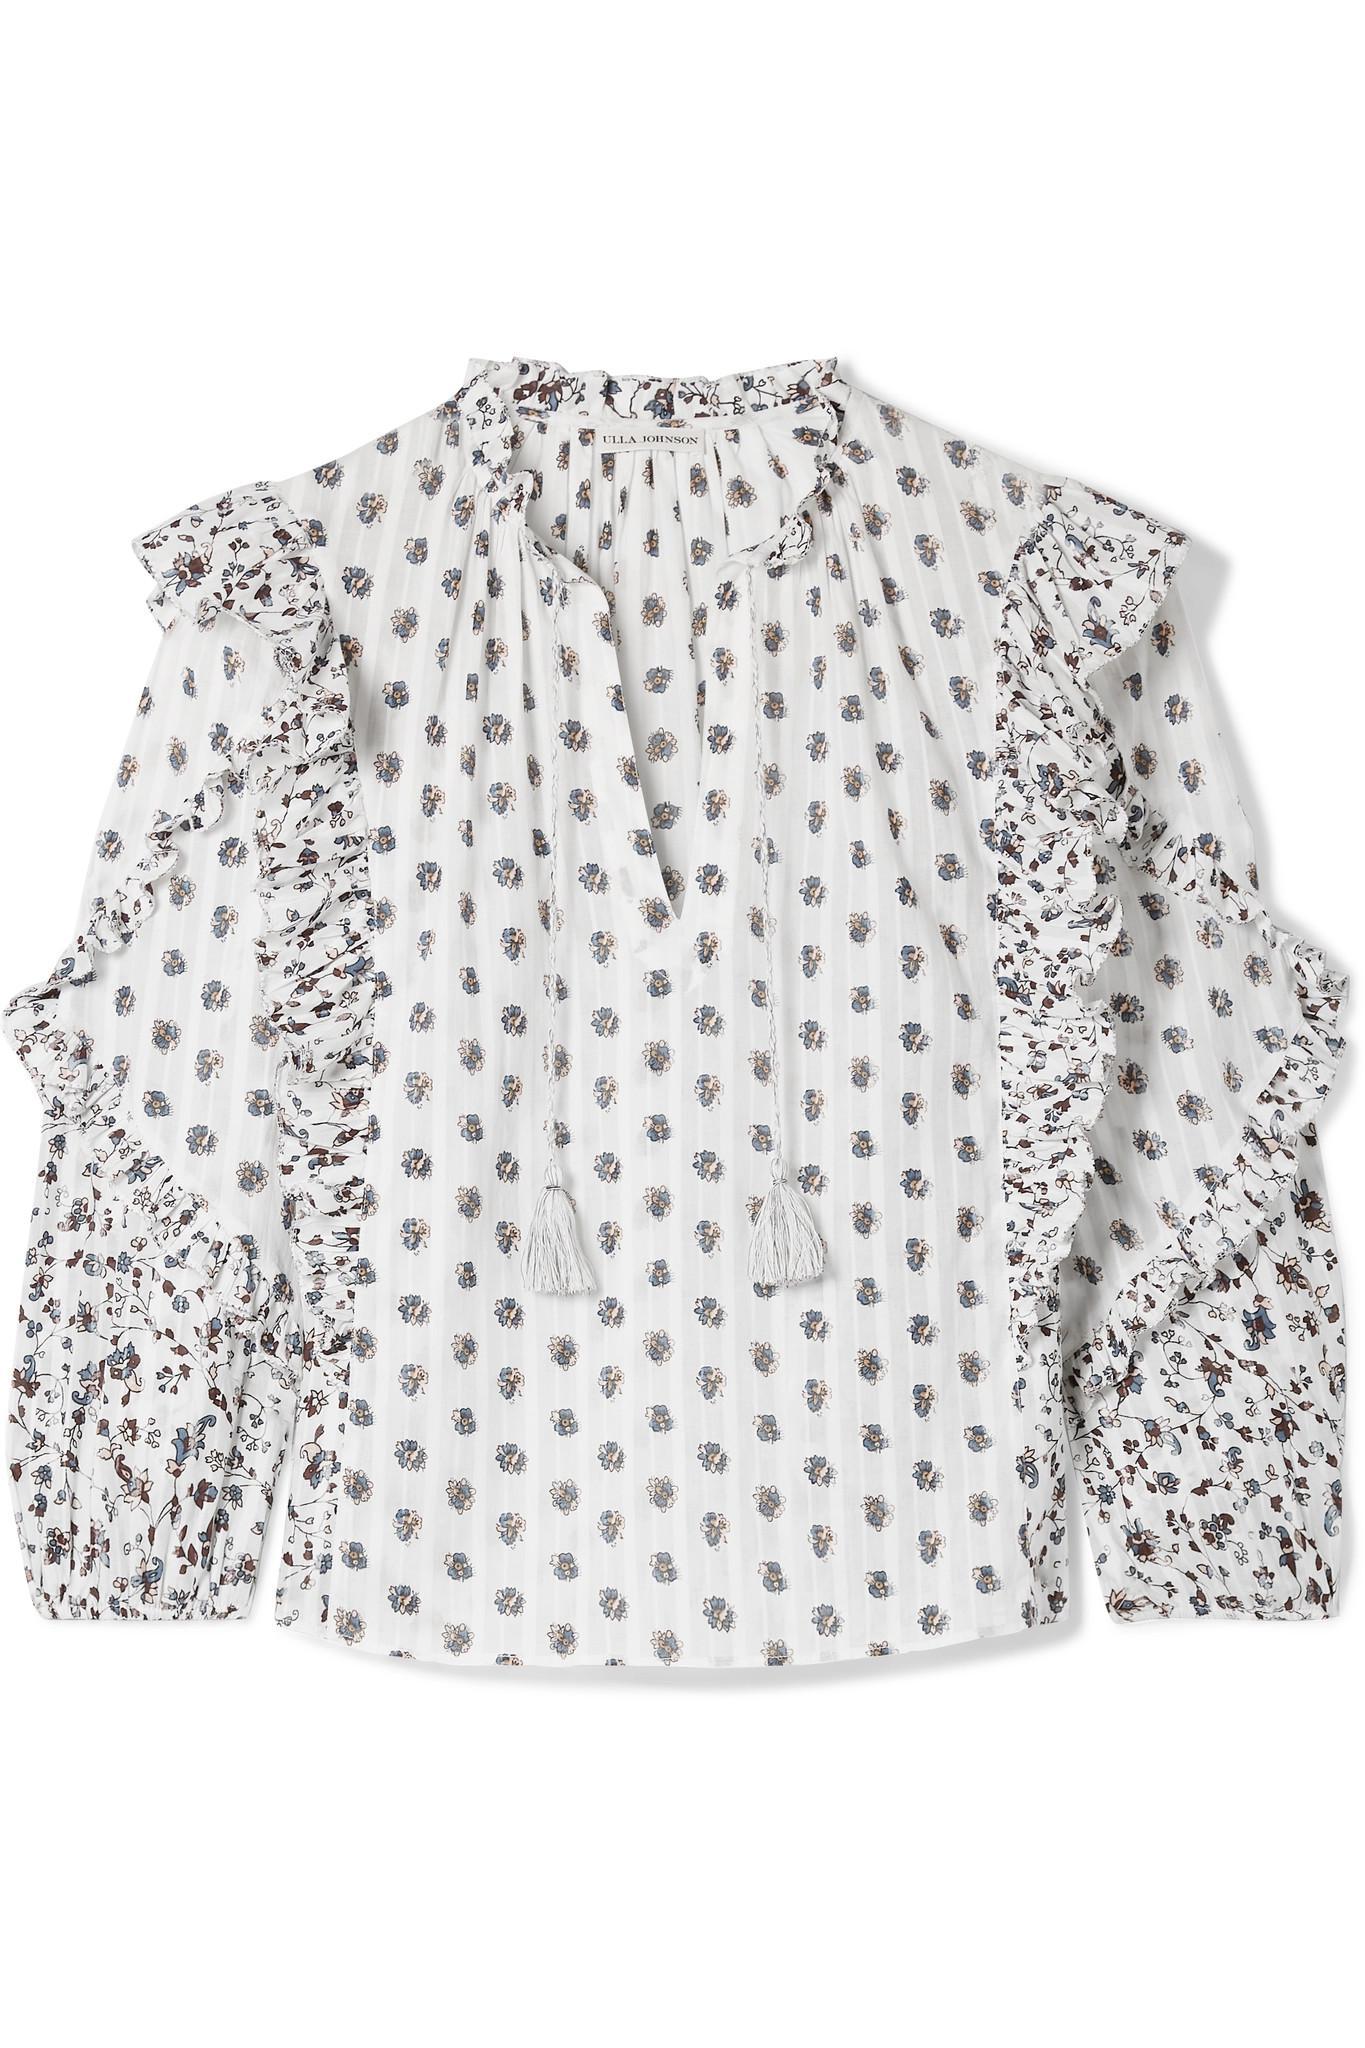 85f3a4d4416e2 Ulla Johnson. Women s Kati Floral-print Cotton-gauze Blouse